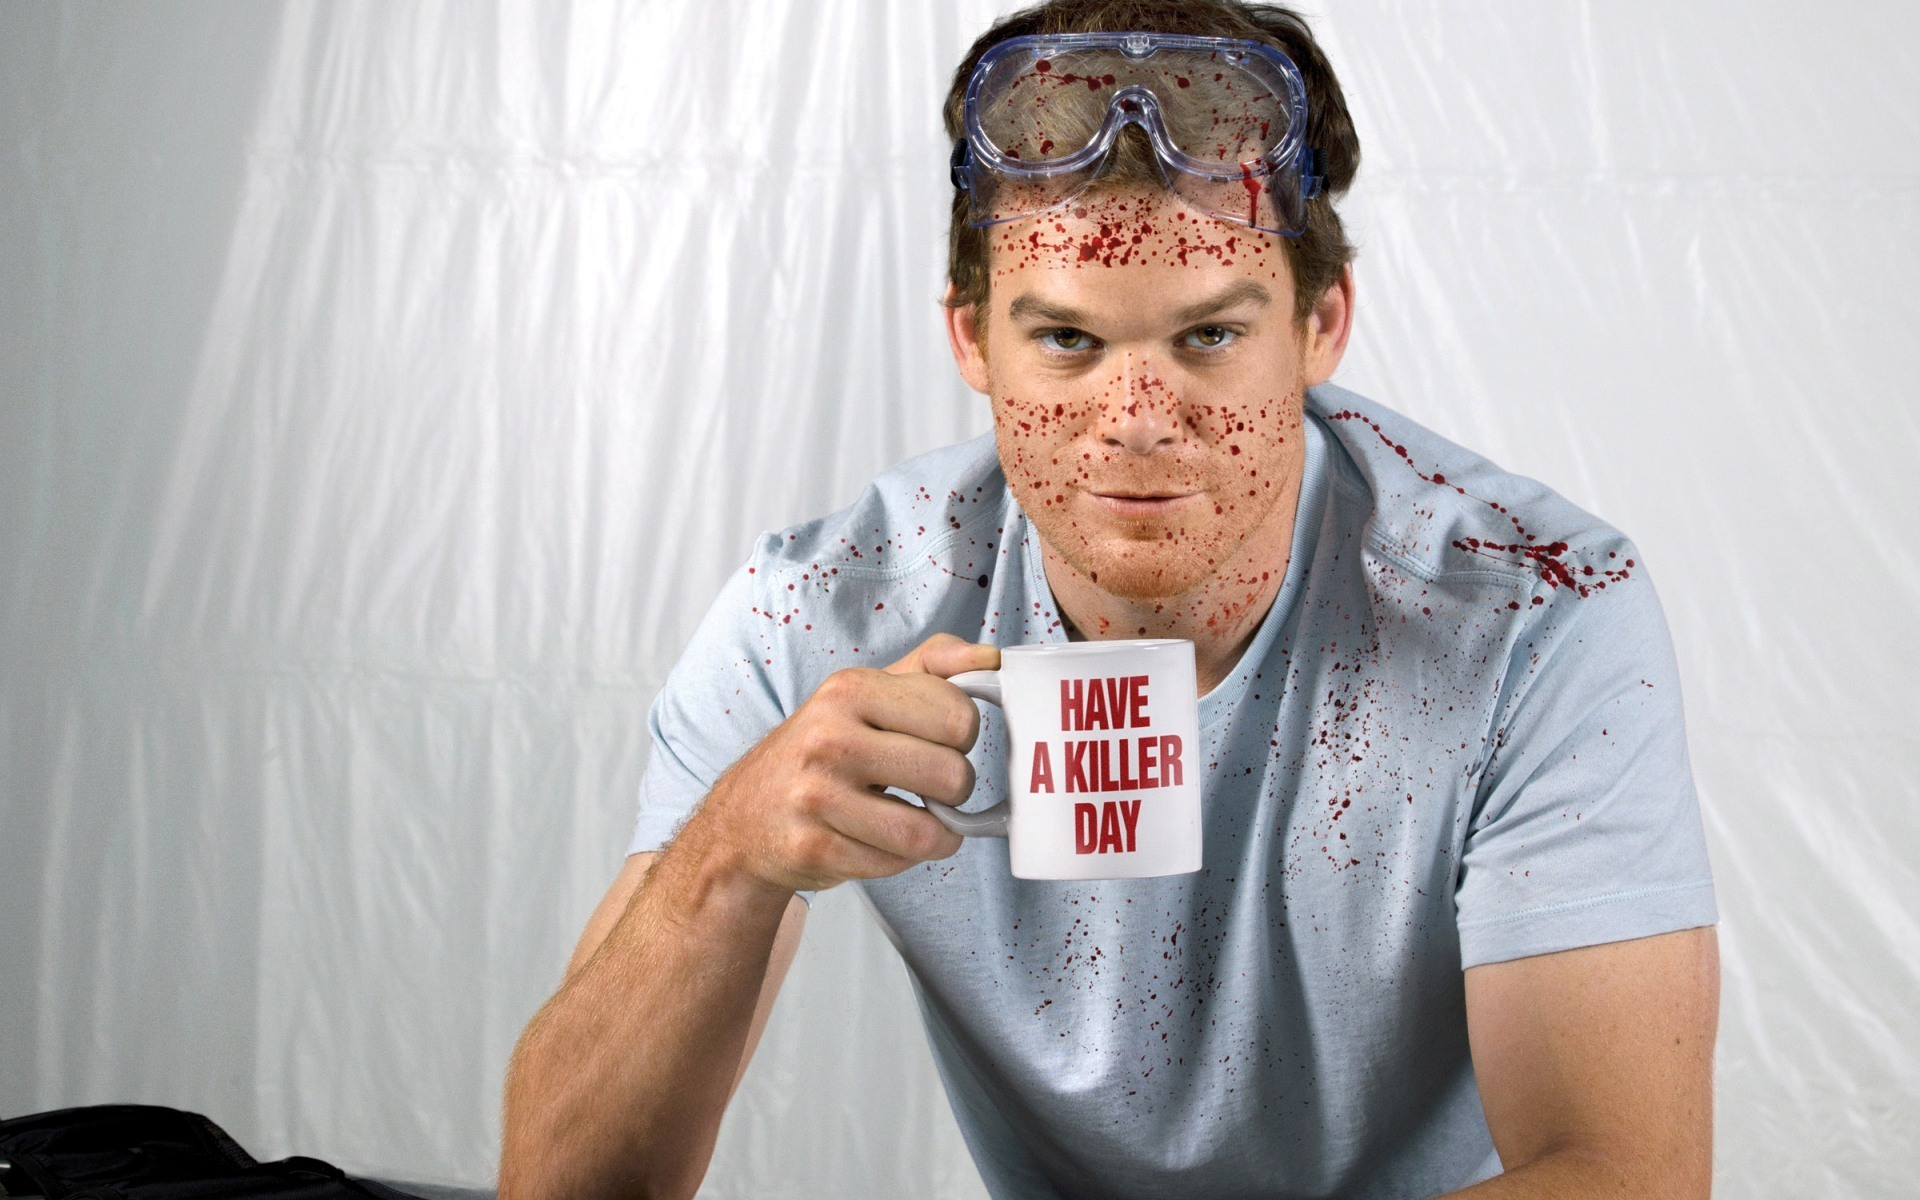 Dexter-Season-6-Dexter-Maniac-Murderer-Splashing-blood-Michael-C.-Hall.jpg